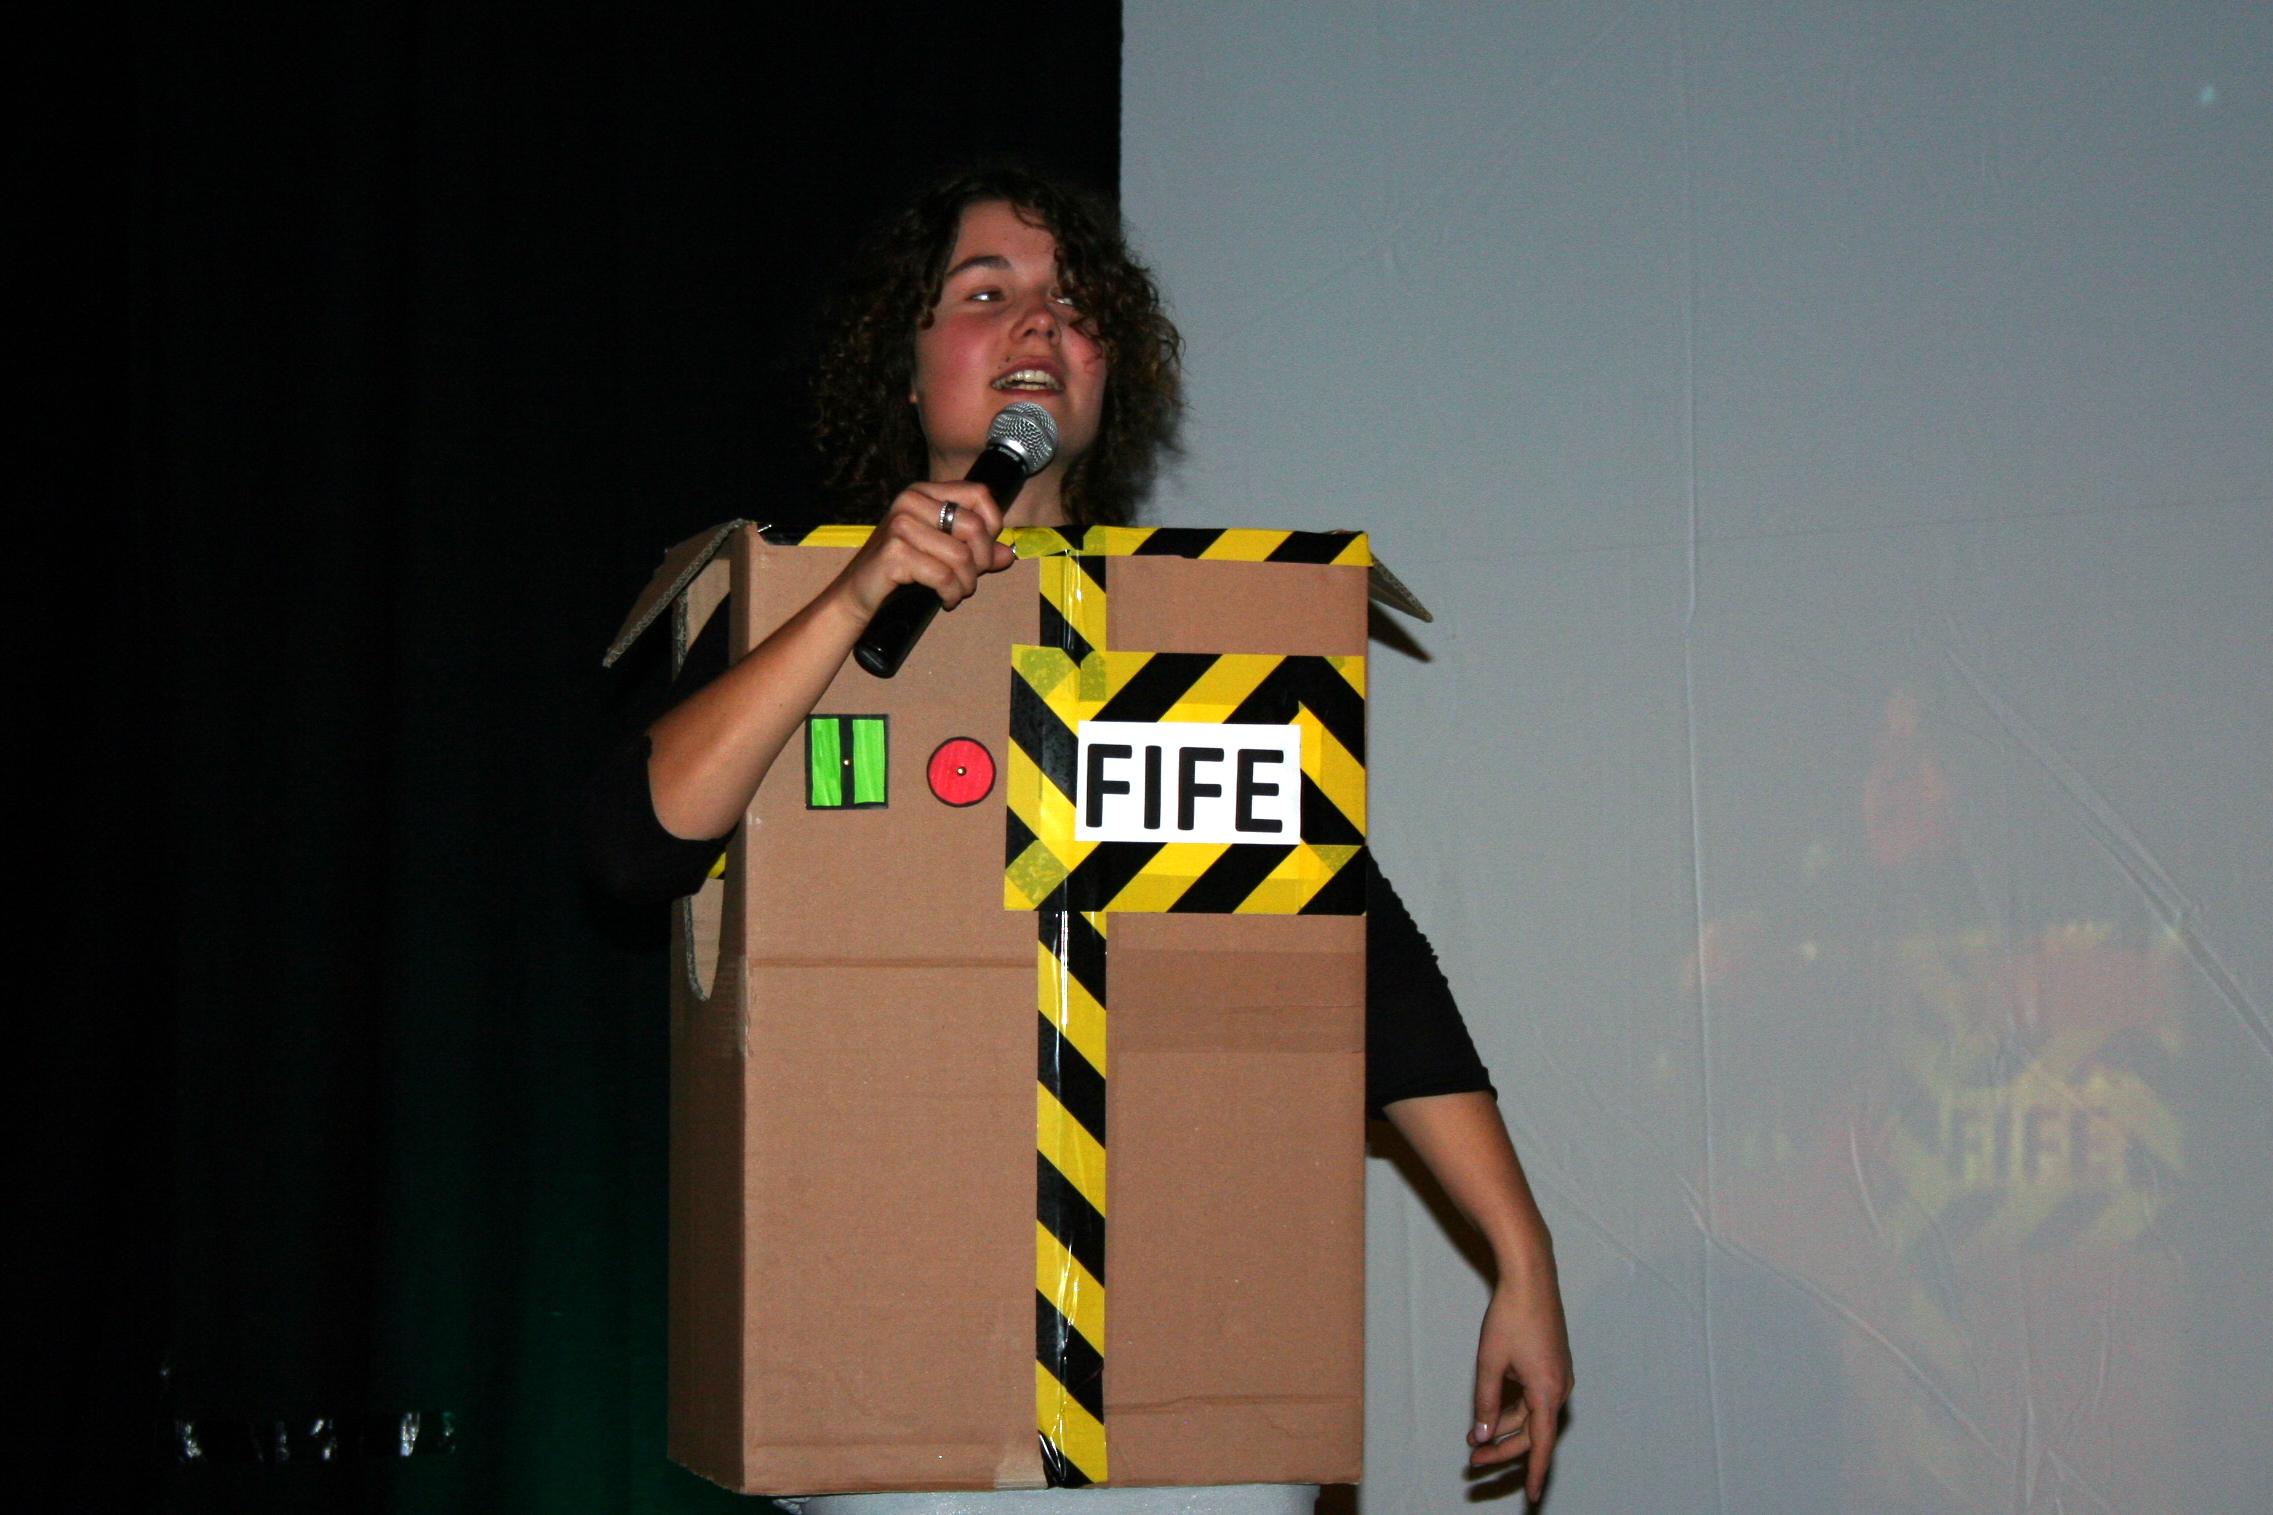 7. MiKiFiFe 2011: Impressionen (8)